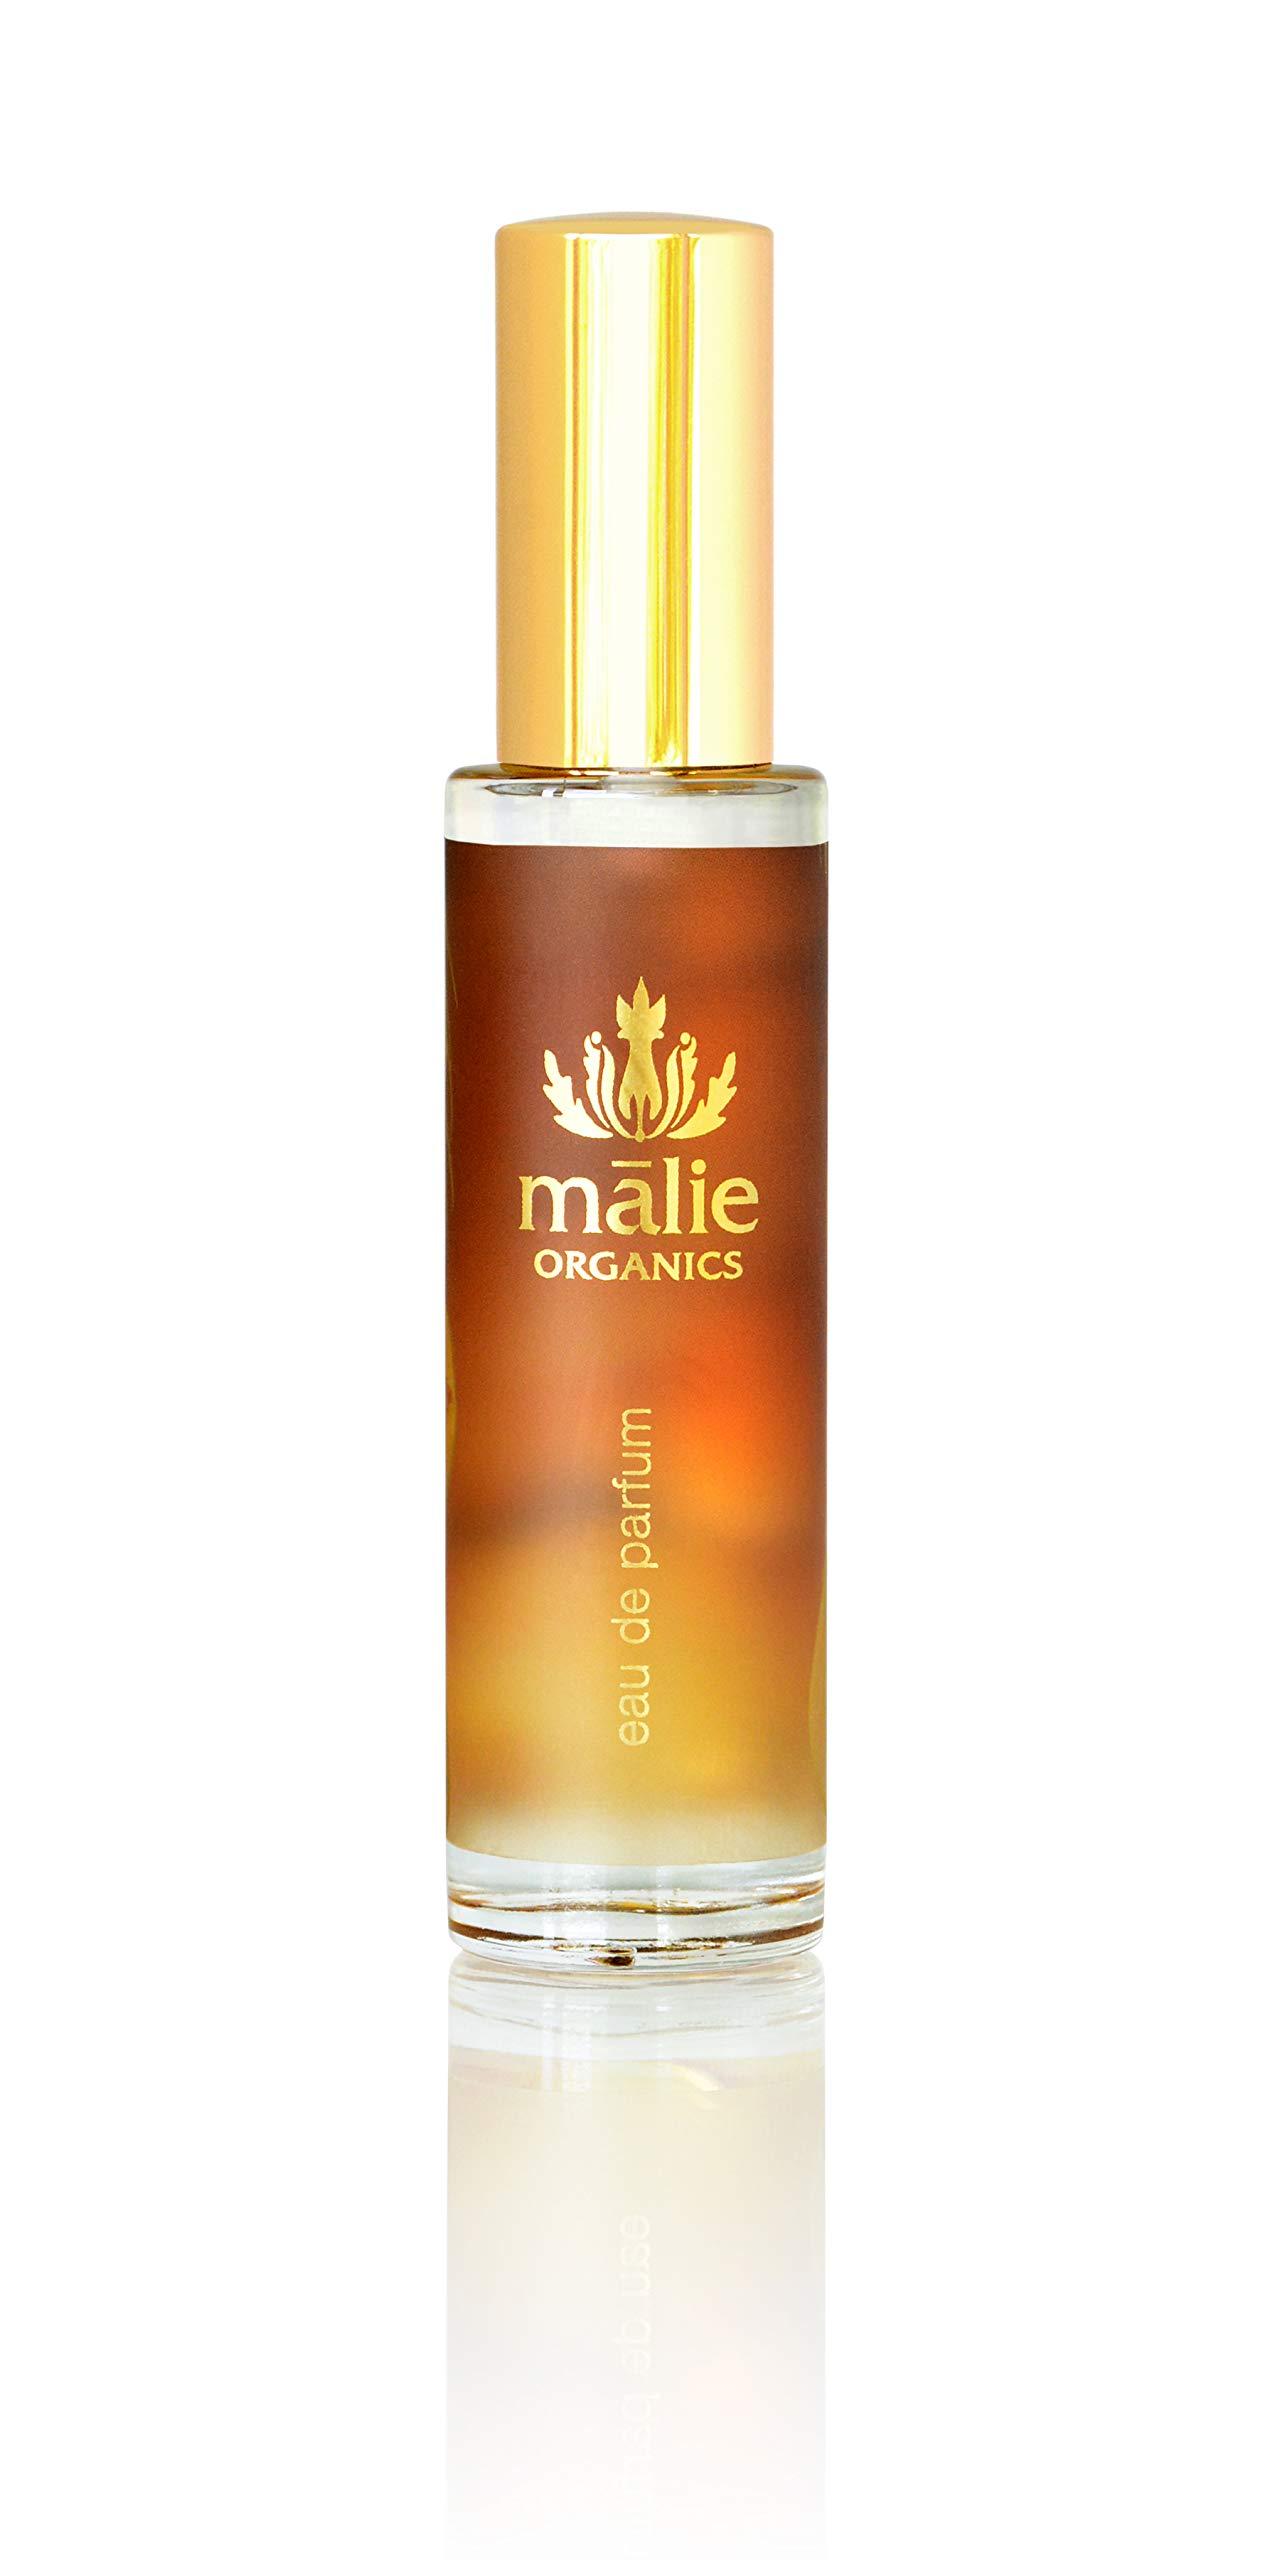 Malie Organics Eau de Parfum - Coconut Vanilla